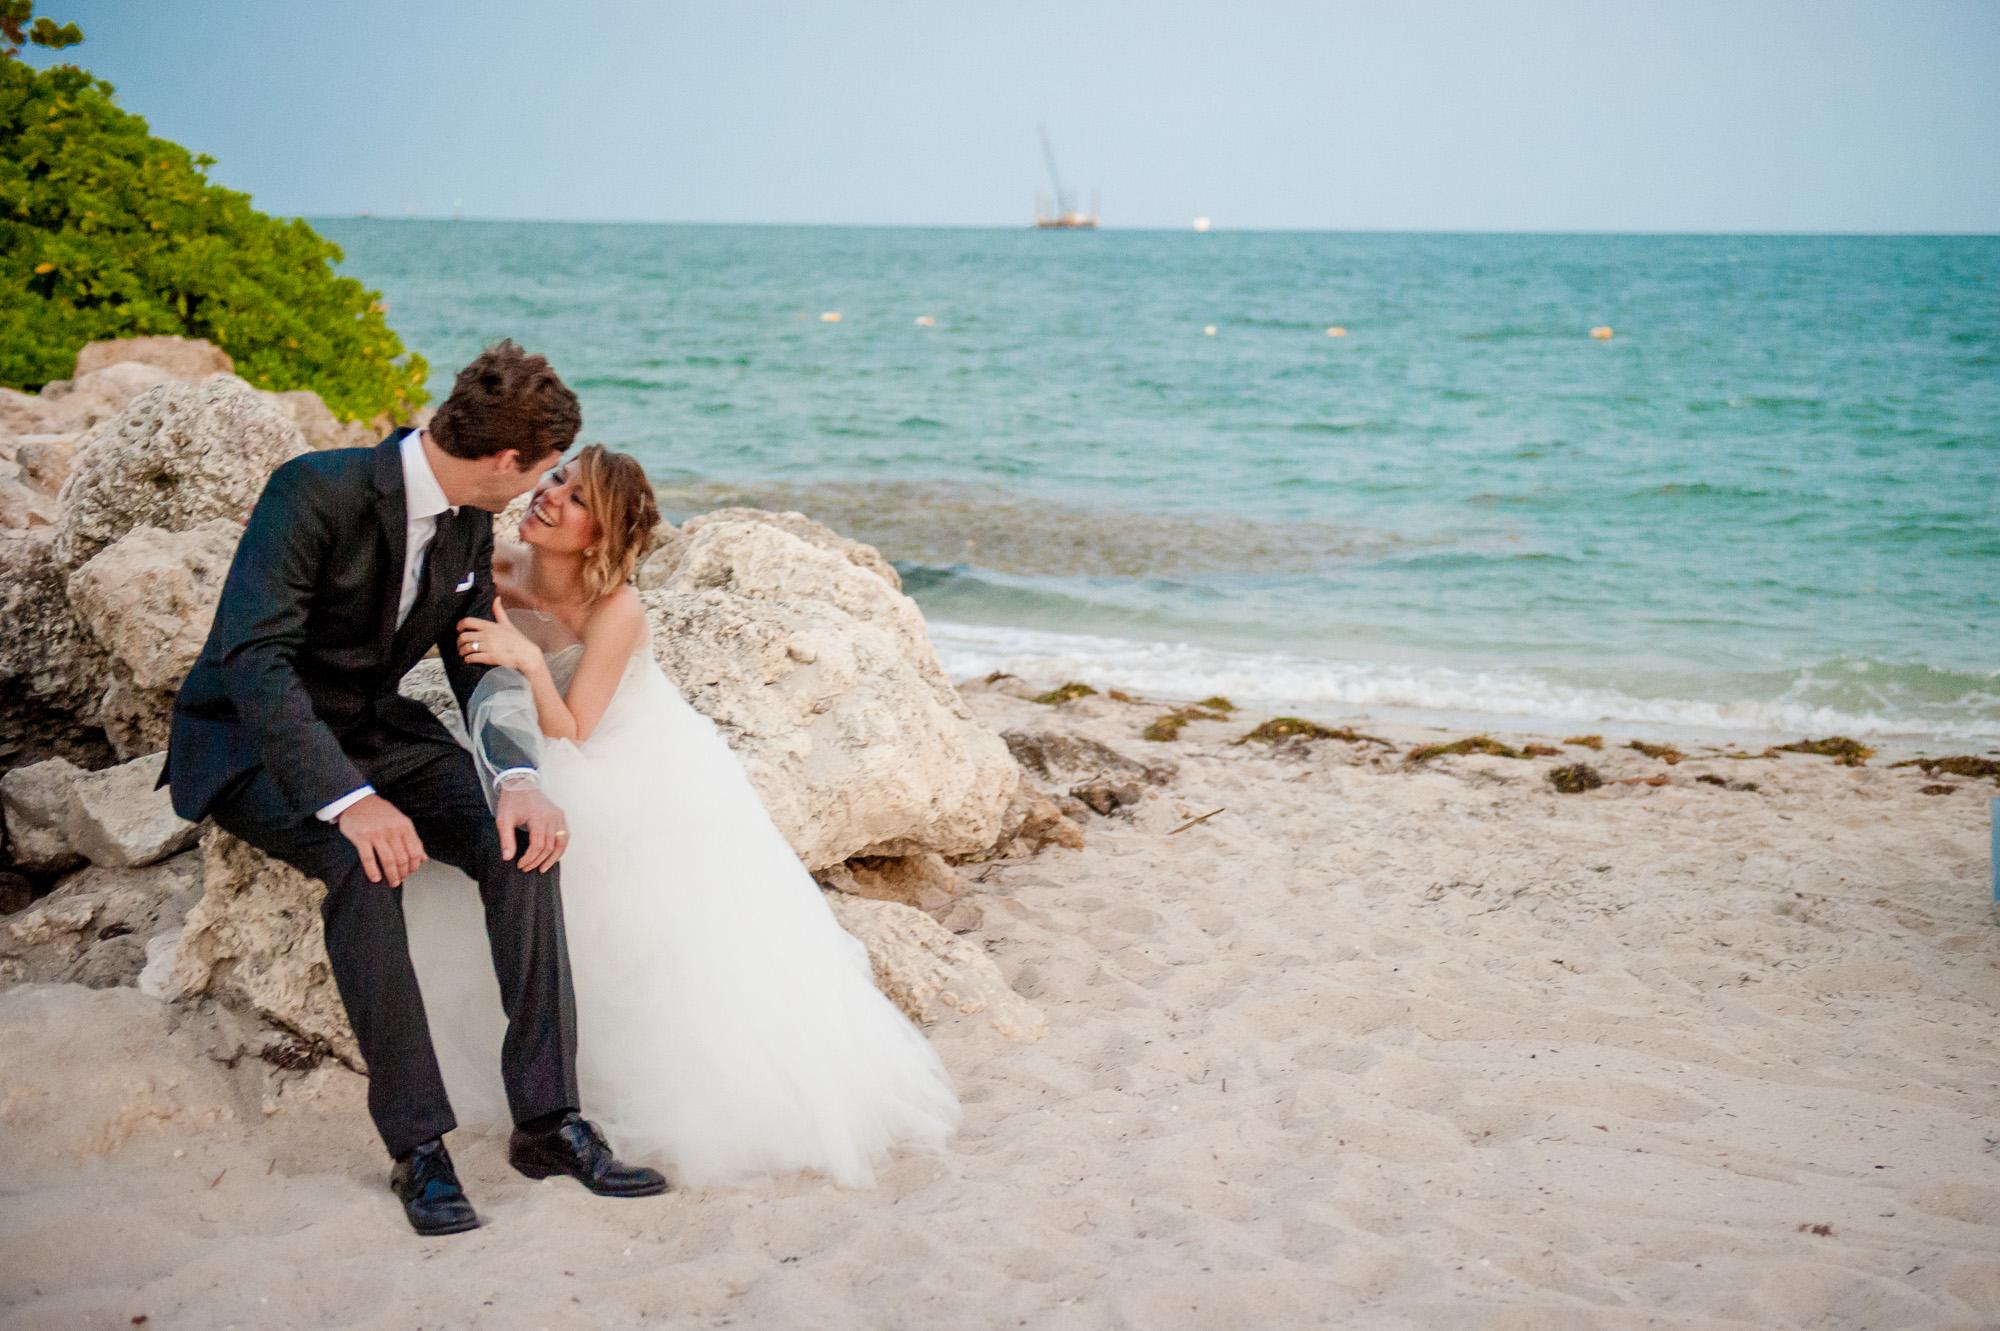 fisher-island-wedding-055.jpg